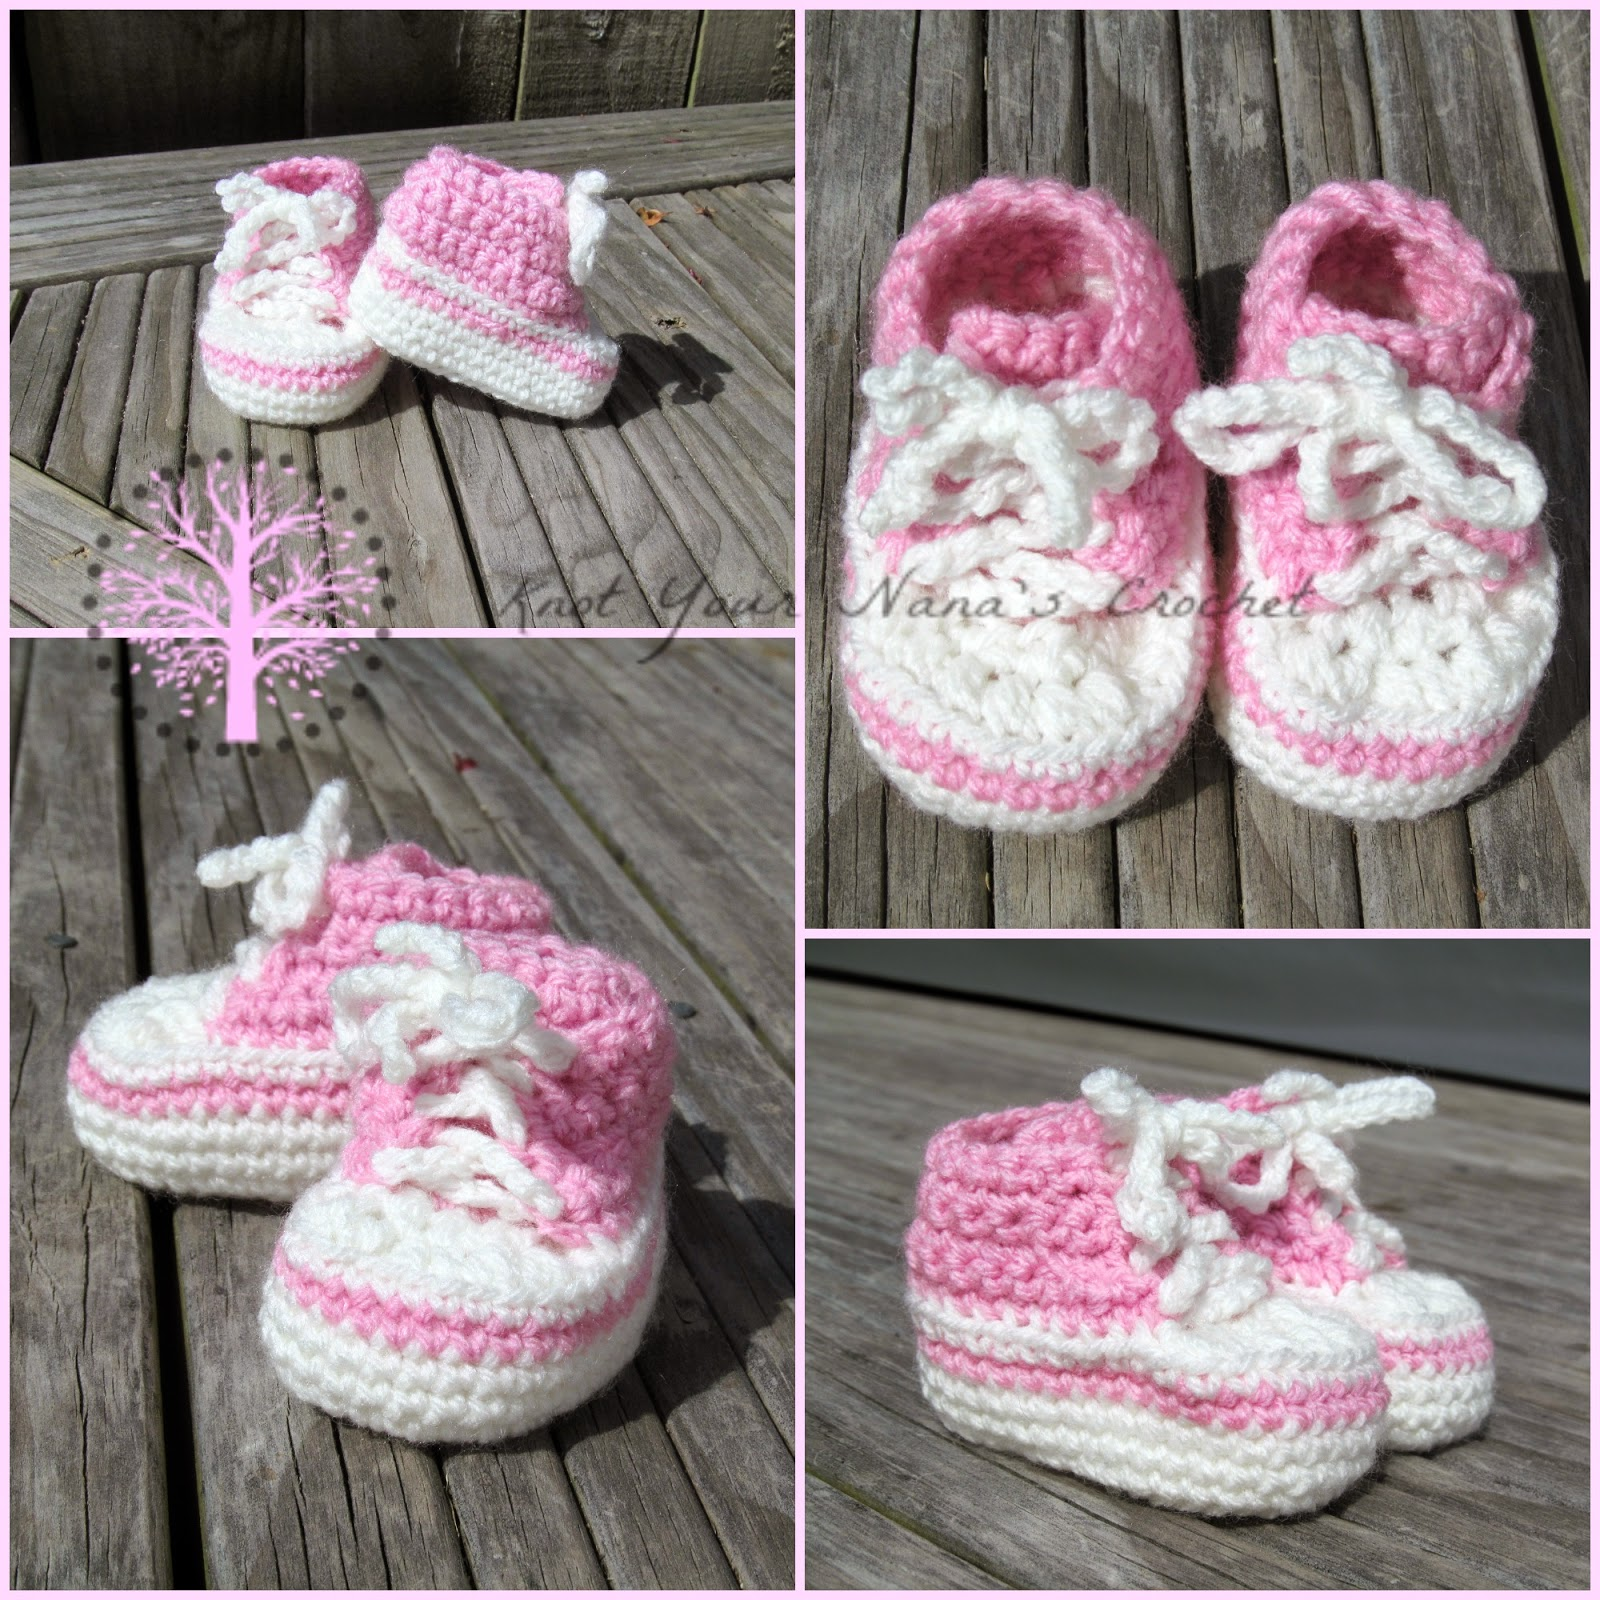 Crochet Converse Newborn High Tops -wonderfuldiy1